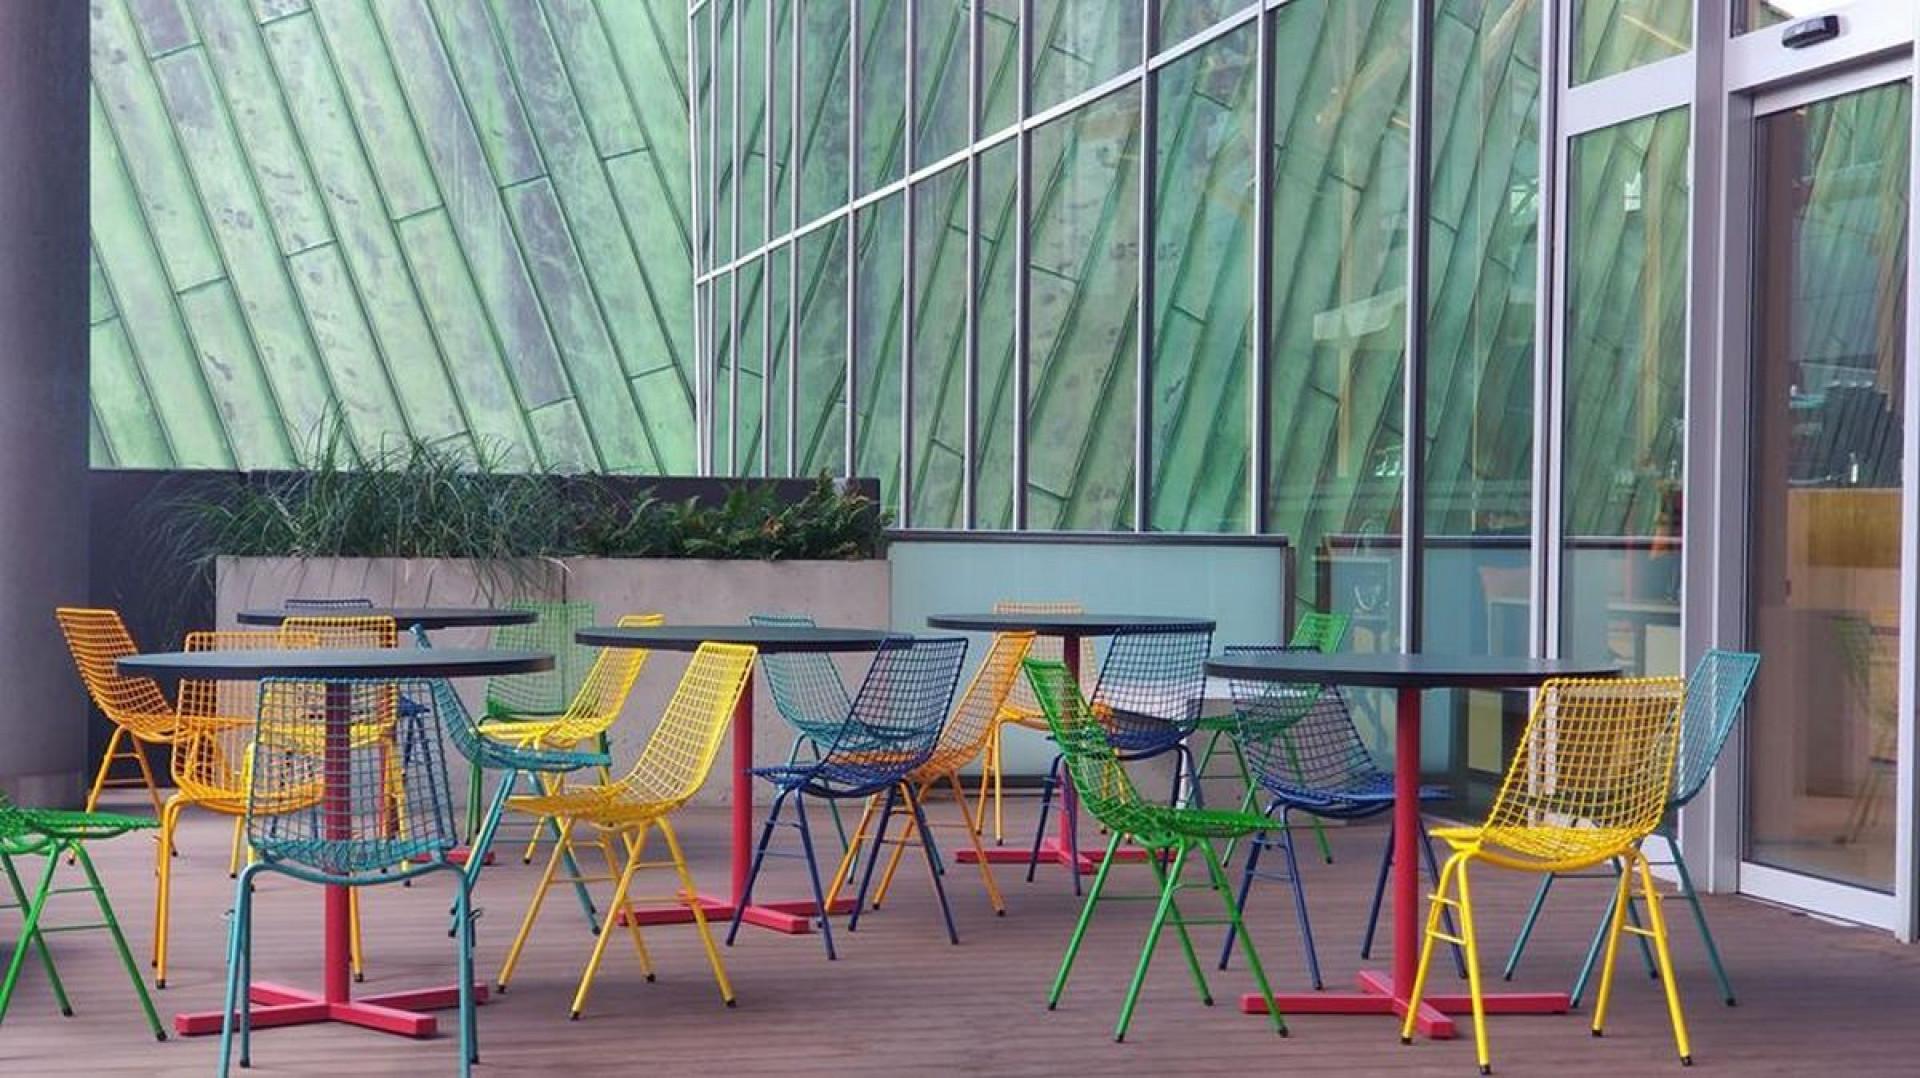 Krzesło siatkowe marki Projekt 68. Fot. Projekt 68